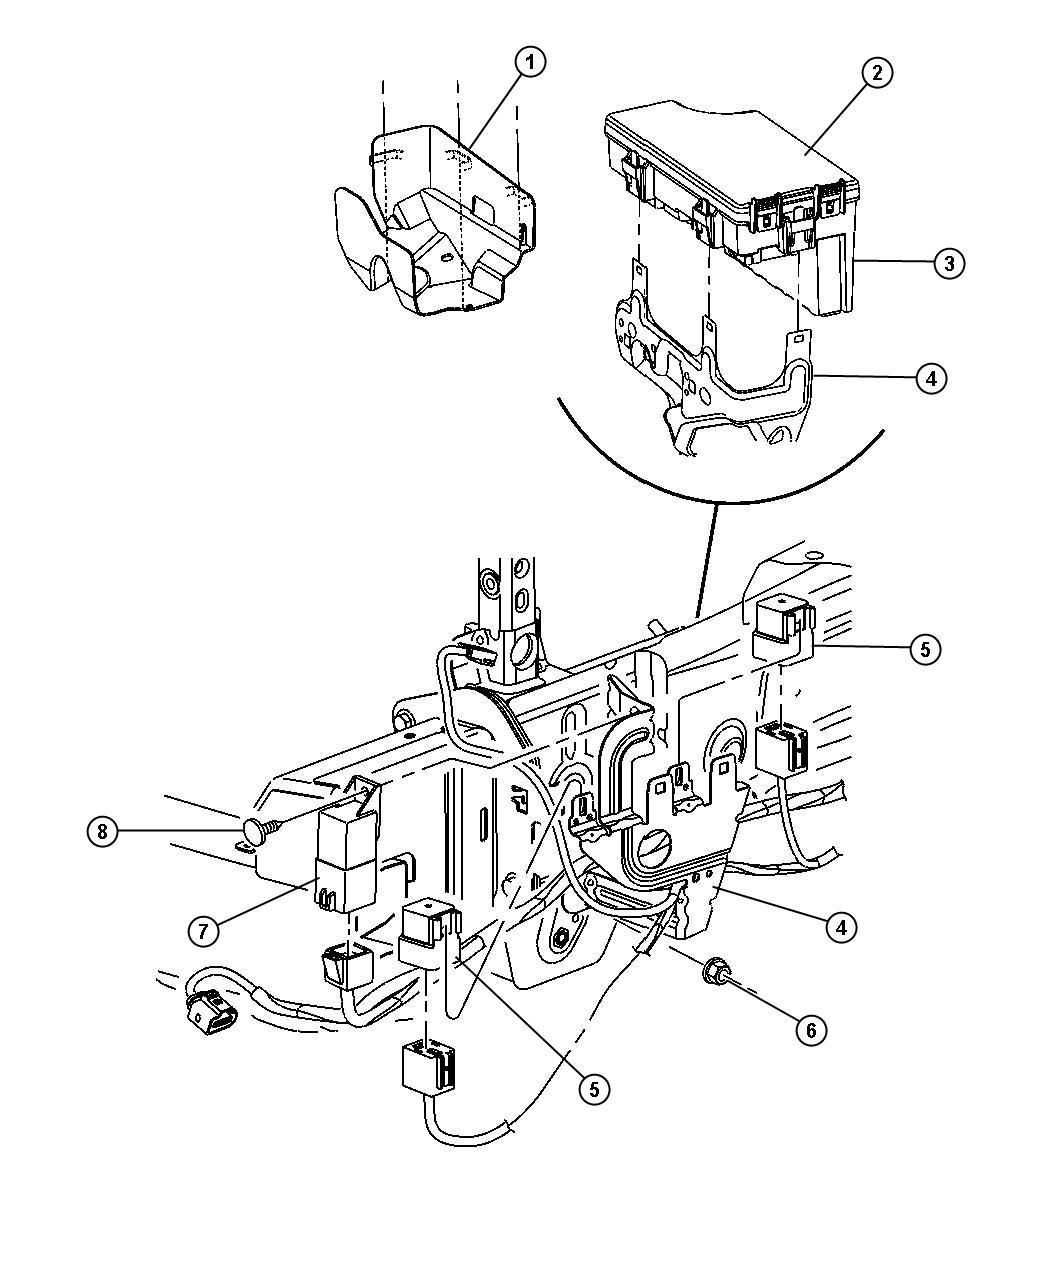 2008 jeep patriot engine diagram